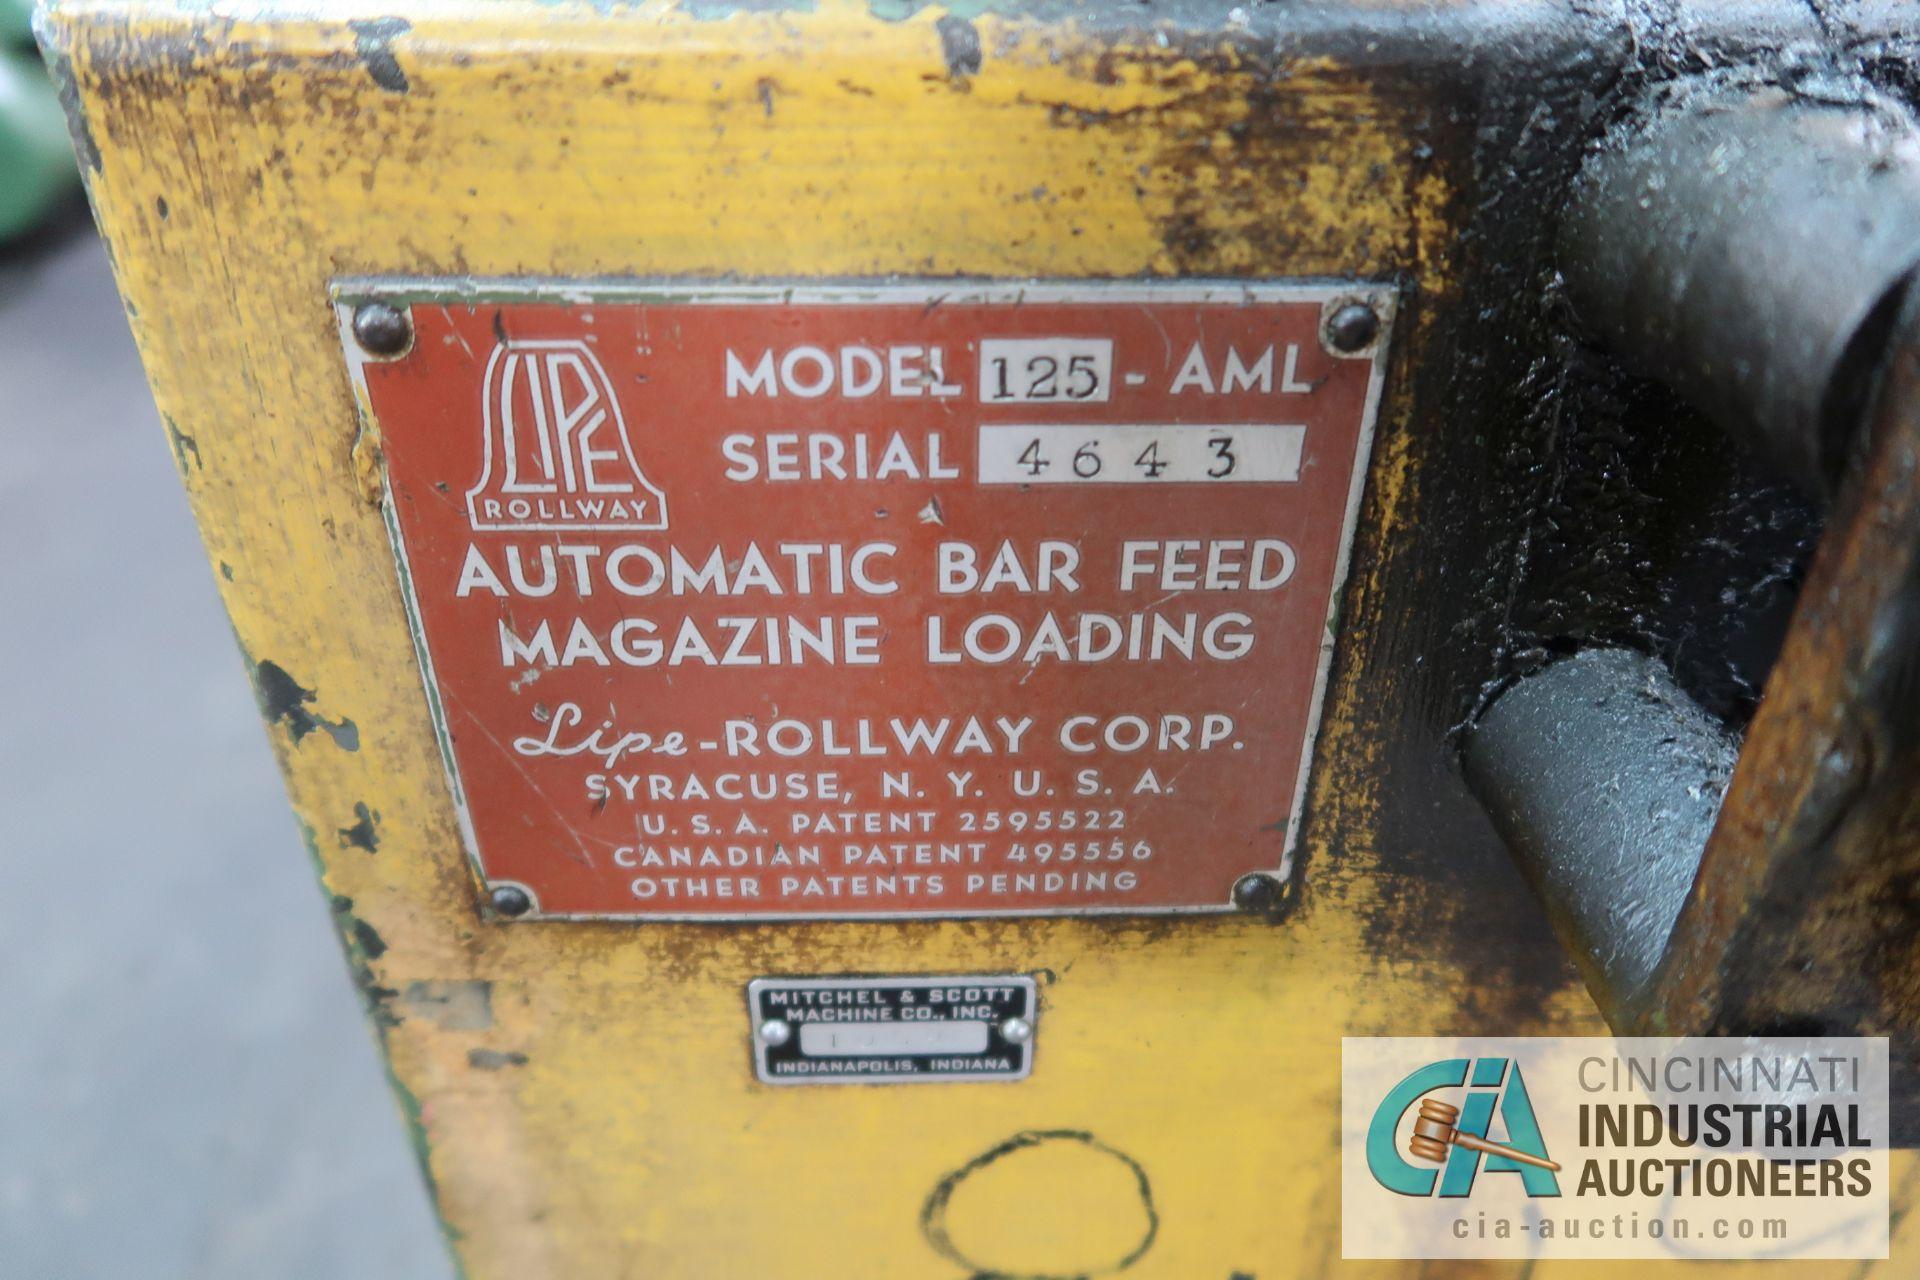 LIPE-ROLLAWAY MODEL 125-AML AUTOMATIC BAR FEED; S/N 4643 - Image 4 of 4